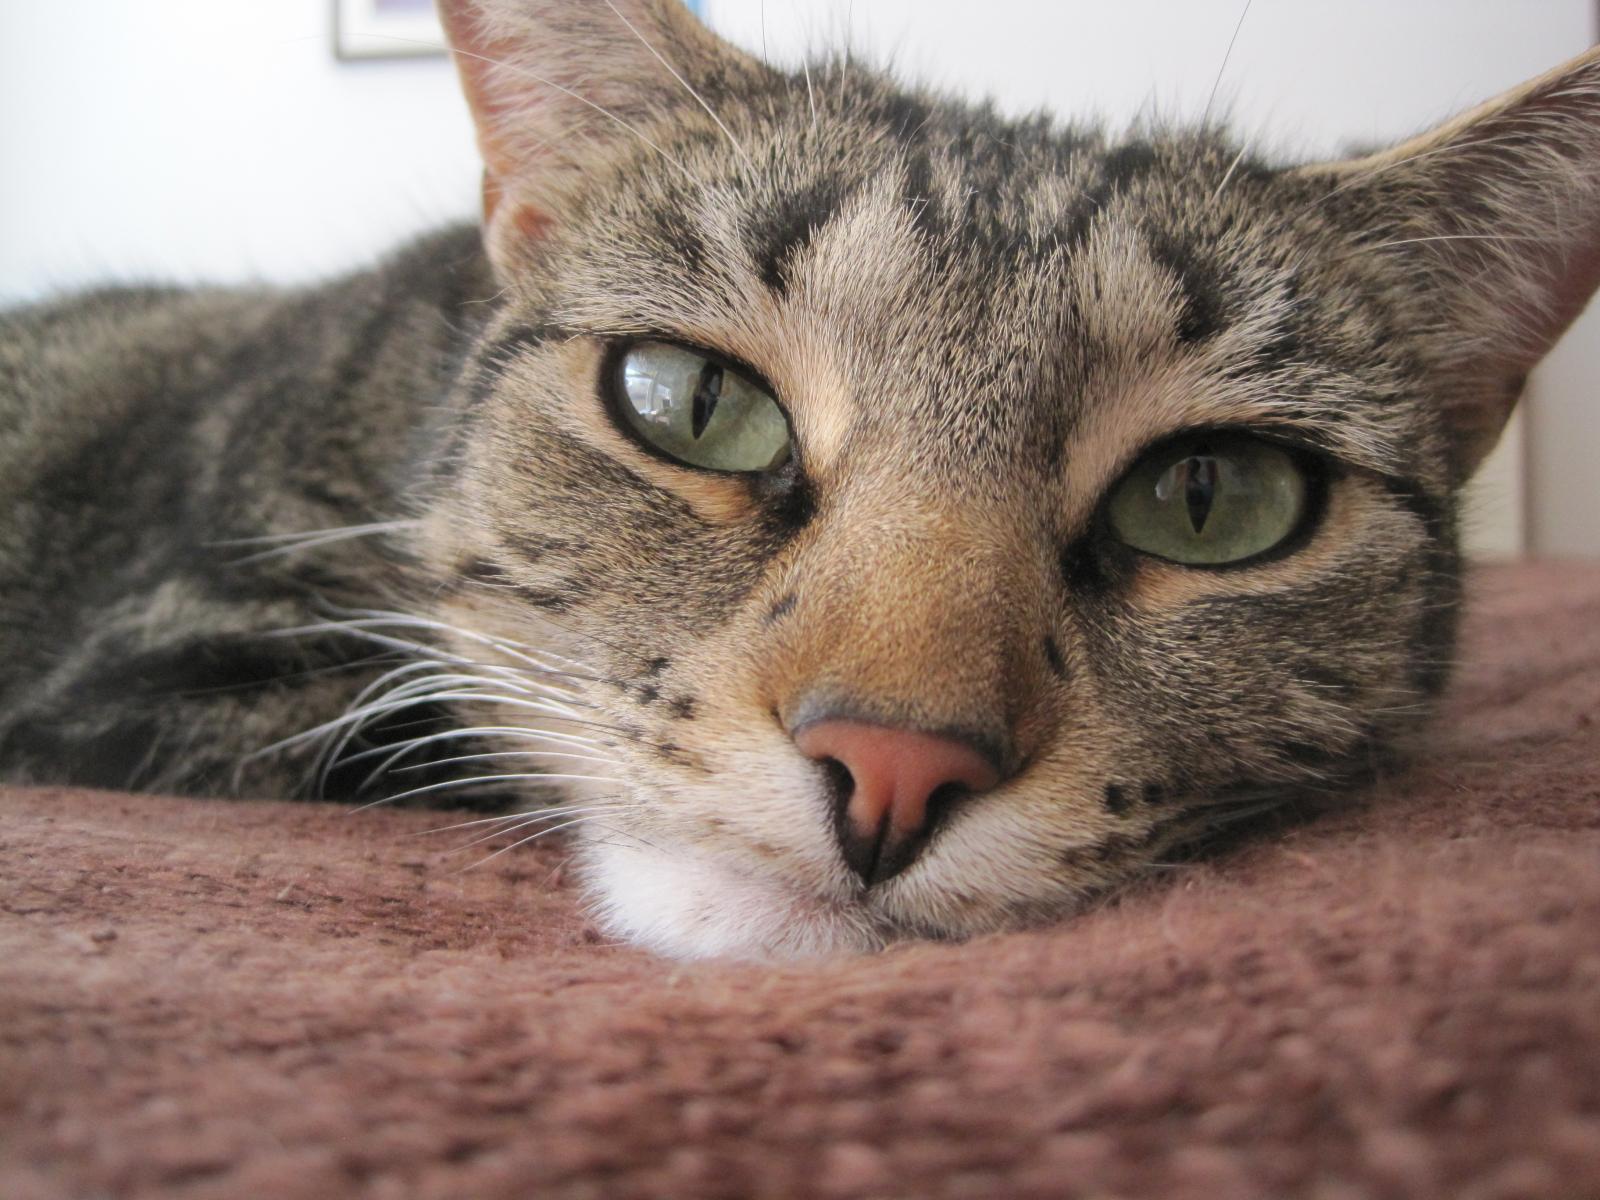 альтернативой этим картинка плачущего котенка вот